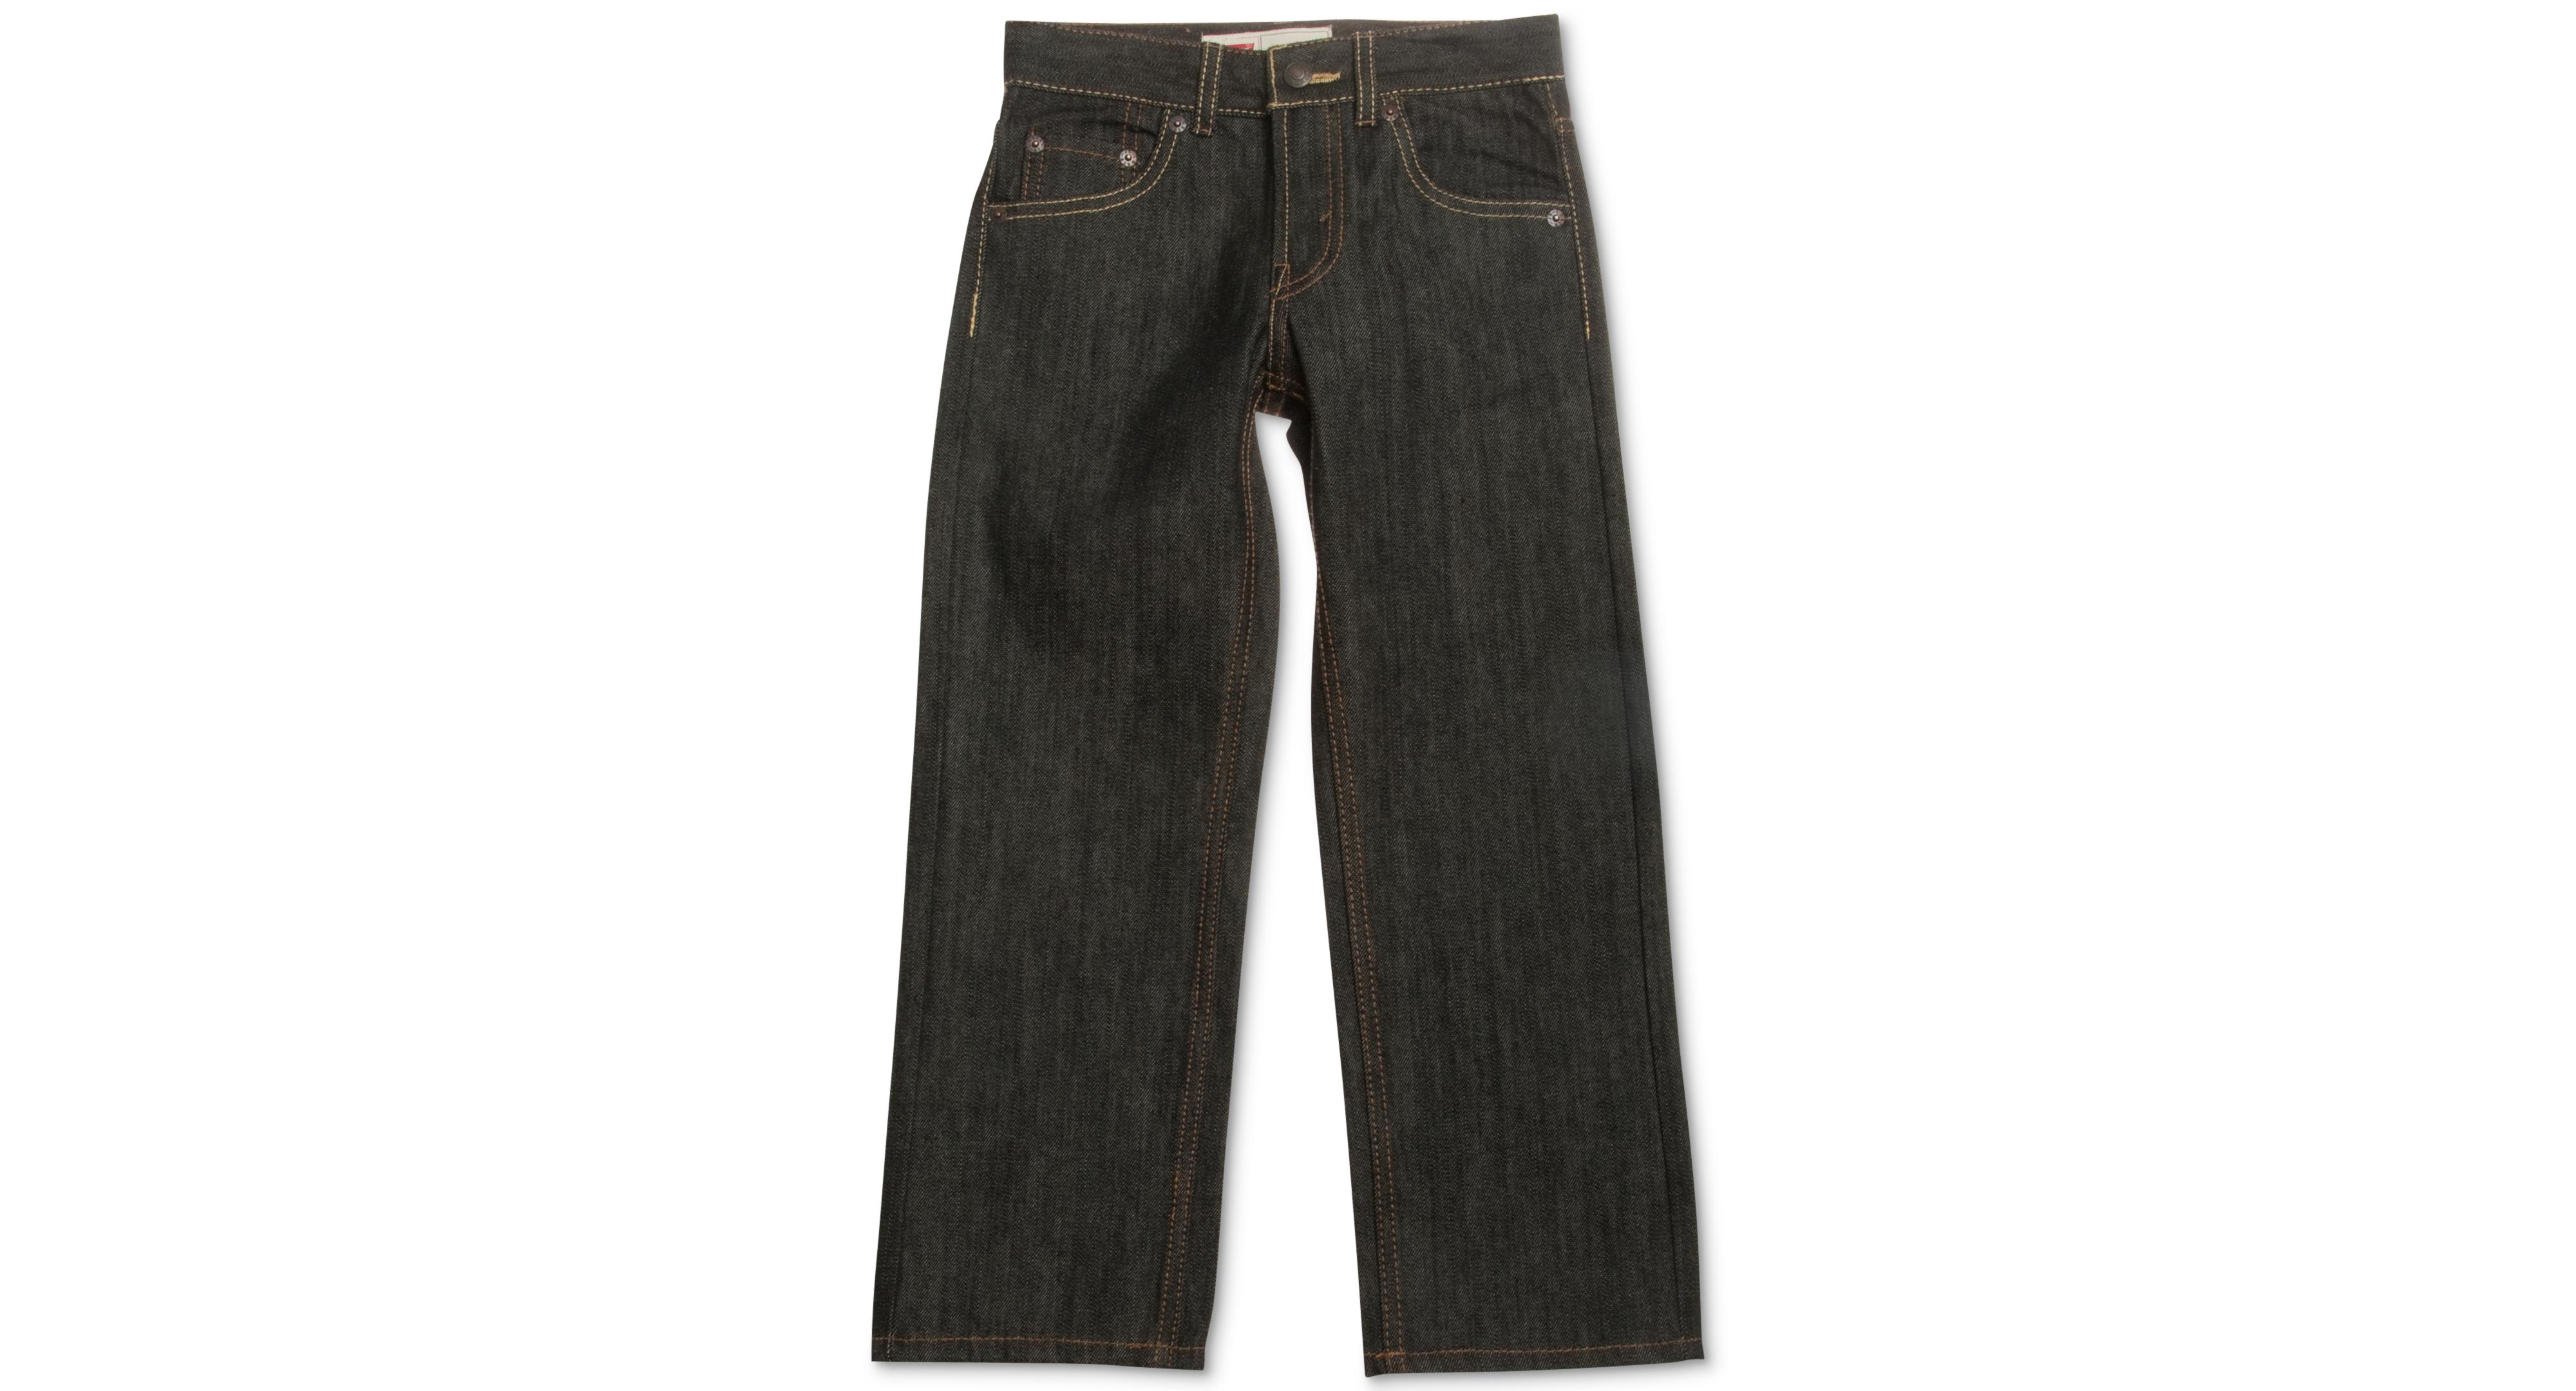 Levi's Boys' 505 Rigid Straight Fit Jeans